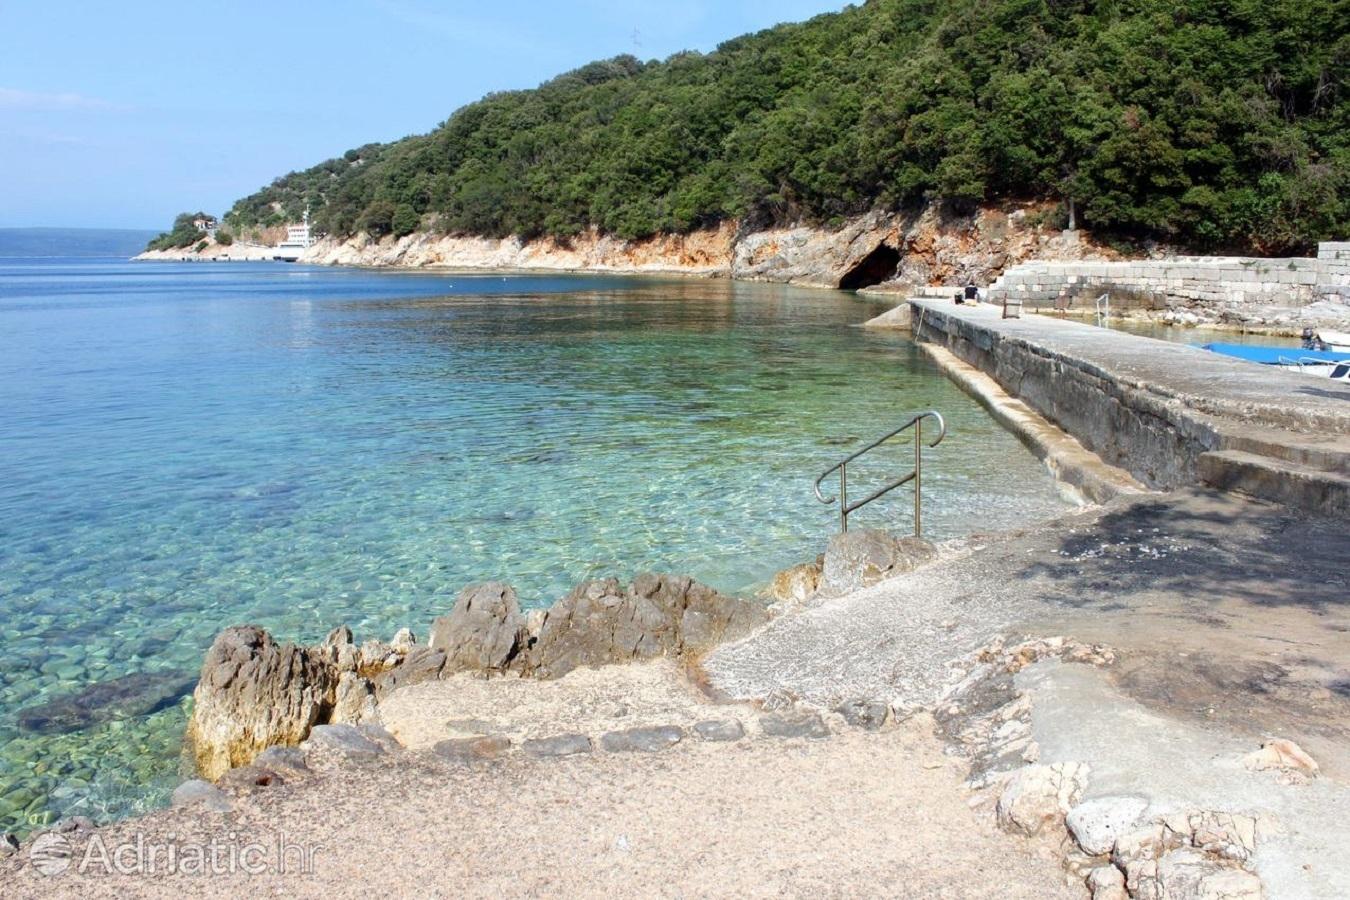 Appartement de vacances BT A2(4) - Merag (769321), Merag, Île de Cres, Kvarner, Croatie, image 10